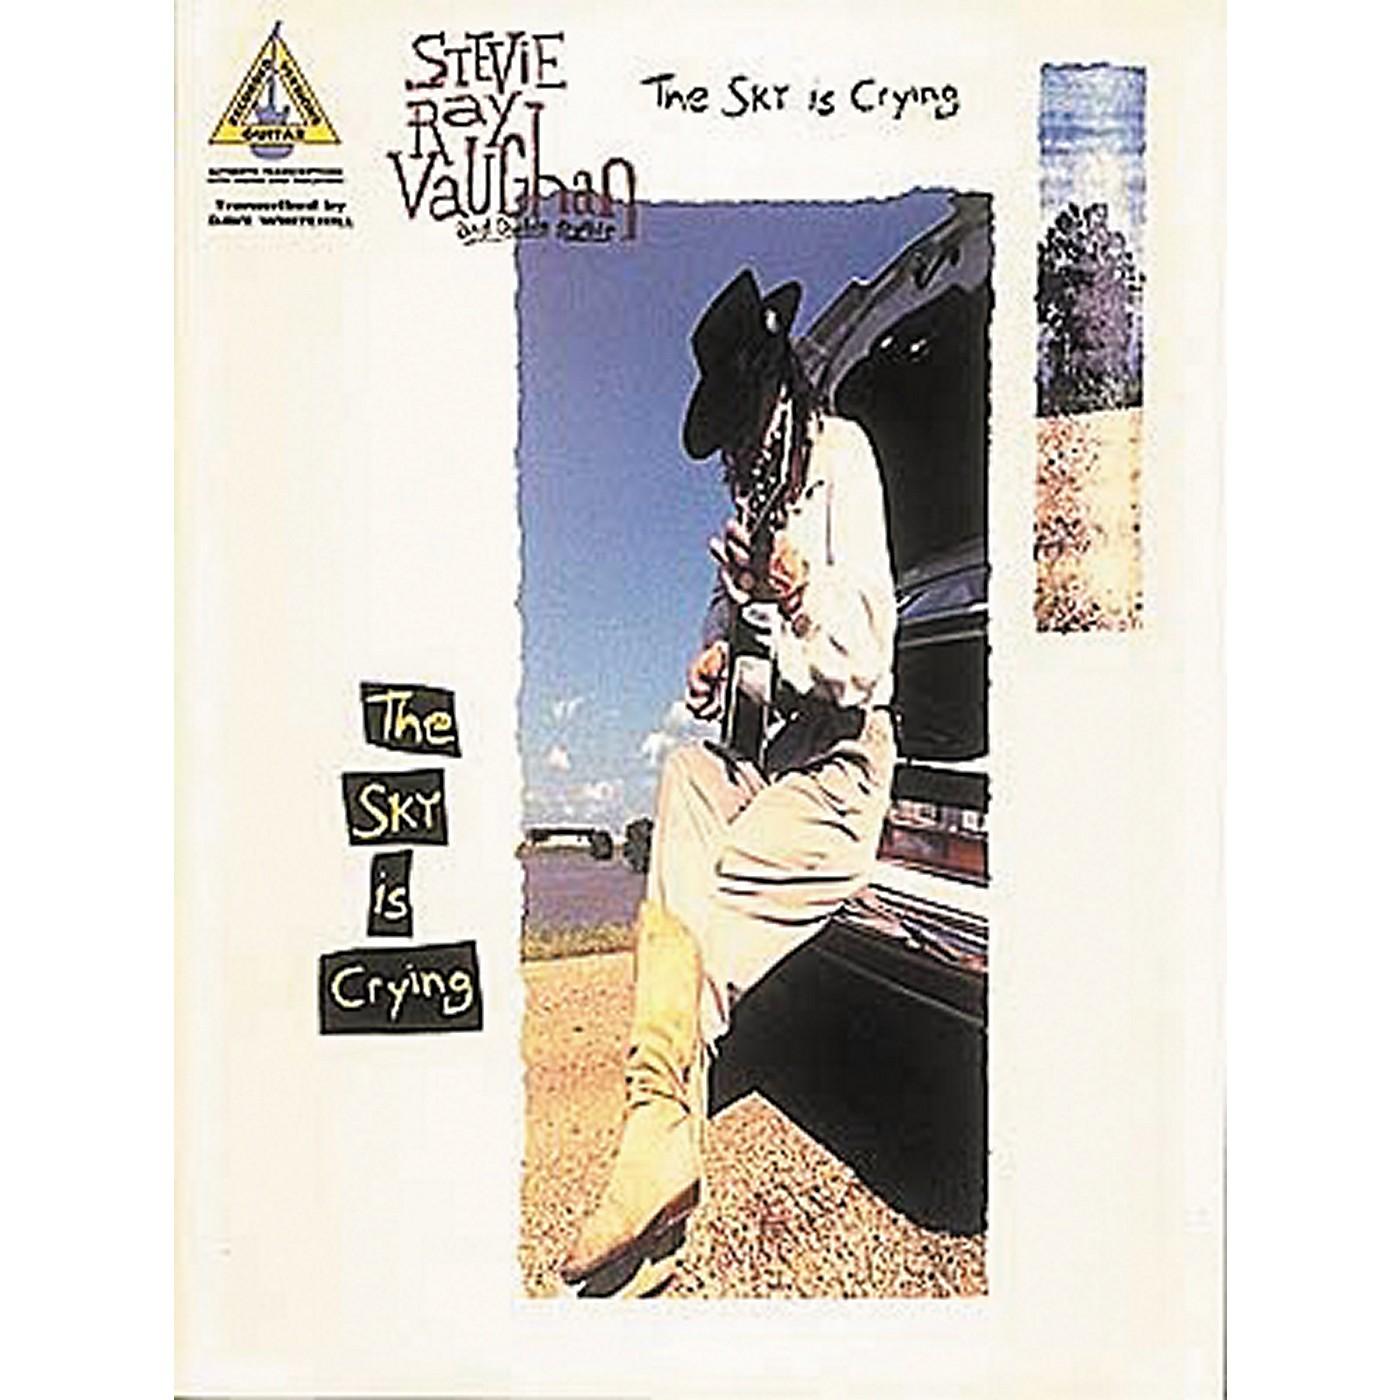 Hal Leonard Stevie Ray Vaughan - The Sky Is Crying Guitar Tab Book thumbnail